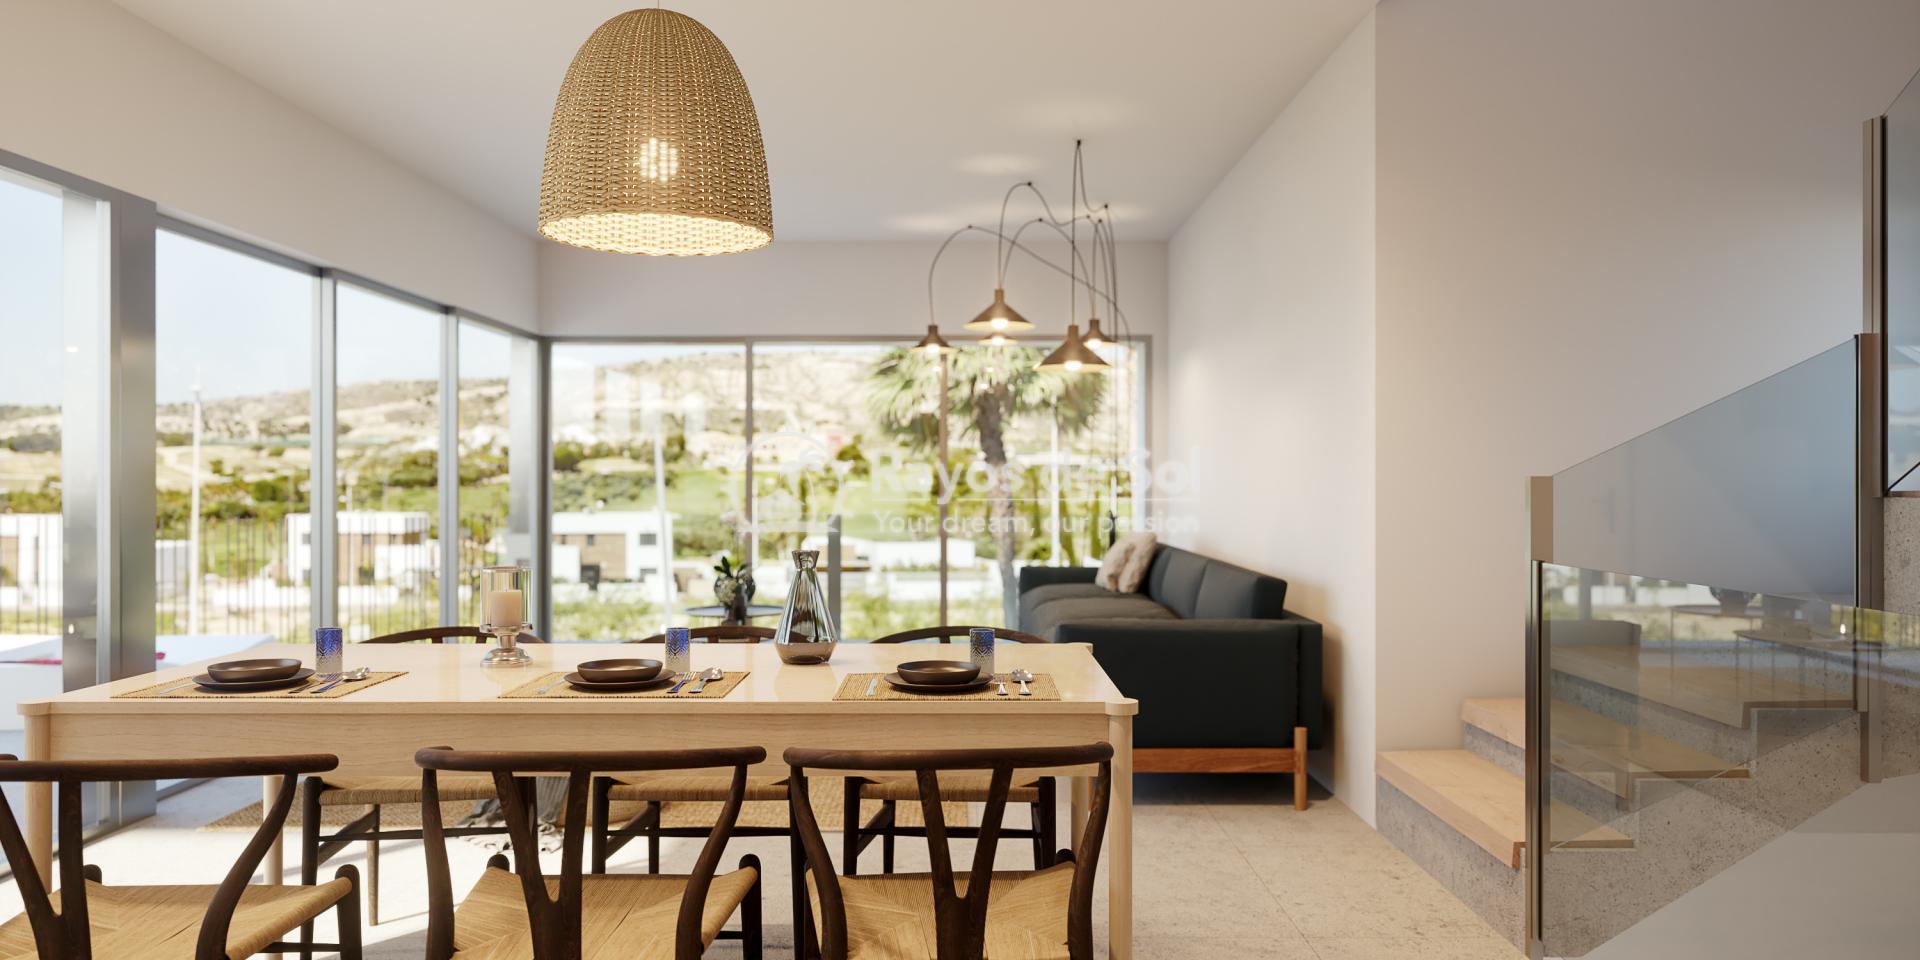 Luxury newbuild villa in La Finca Golf, Algorfa, Costa Blanca (LFPADI) - 8